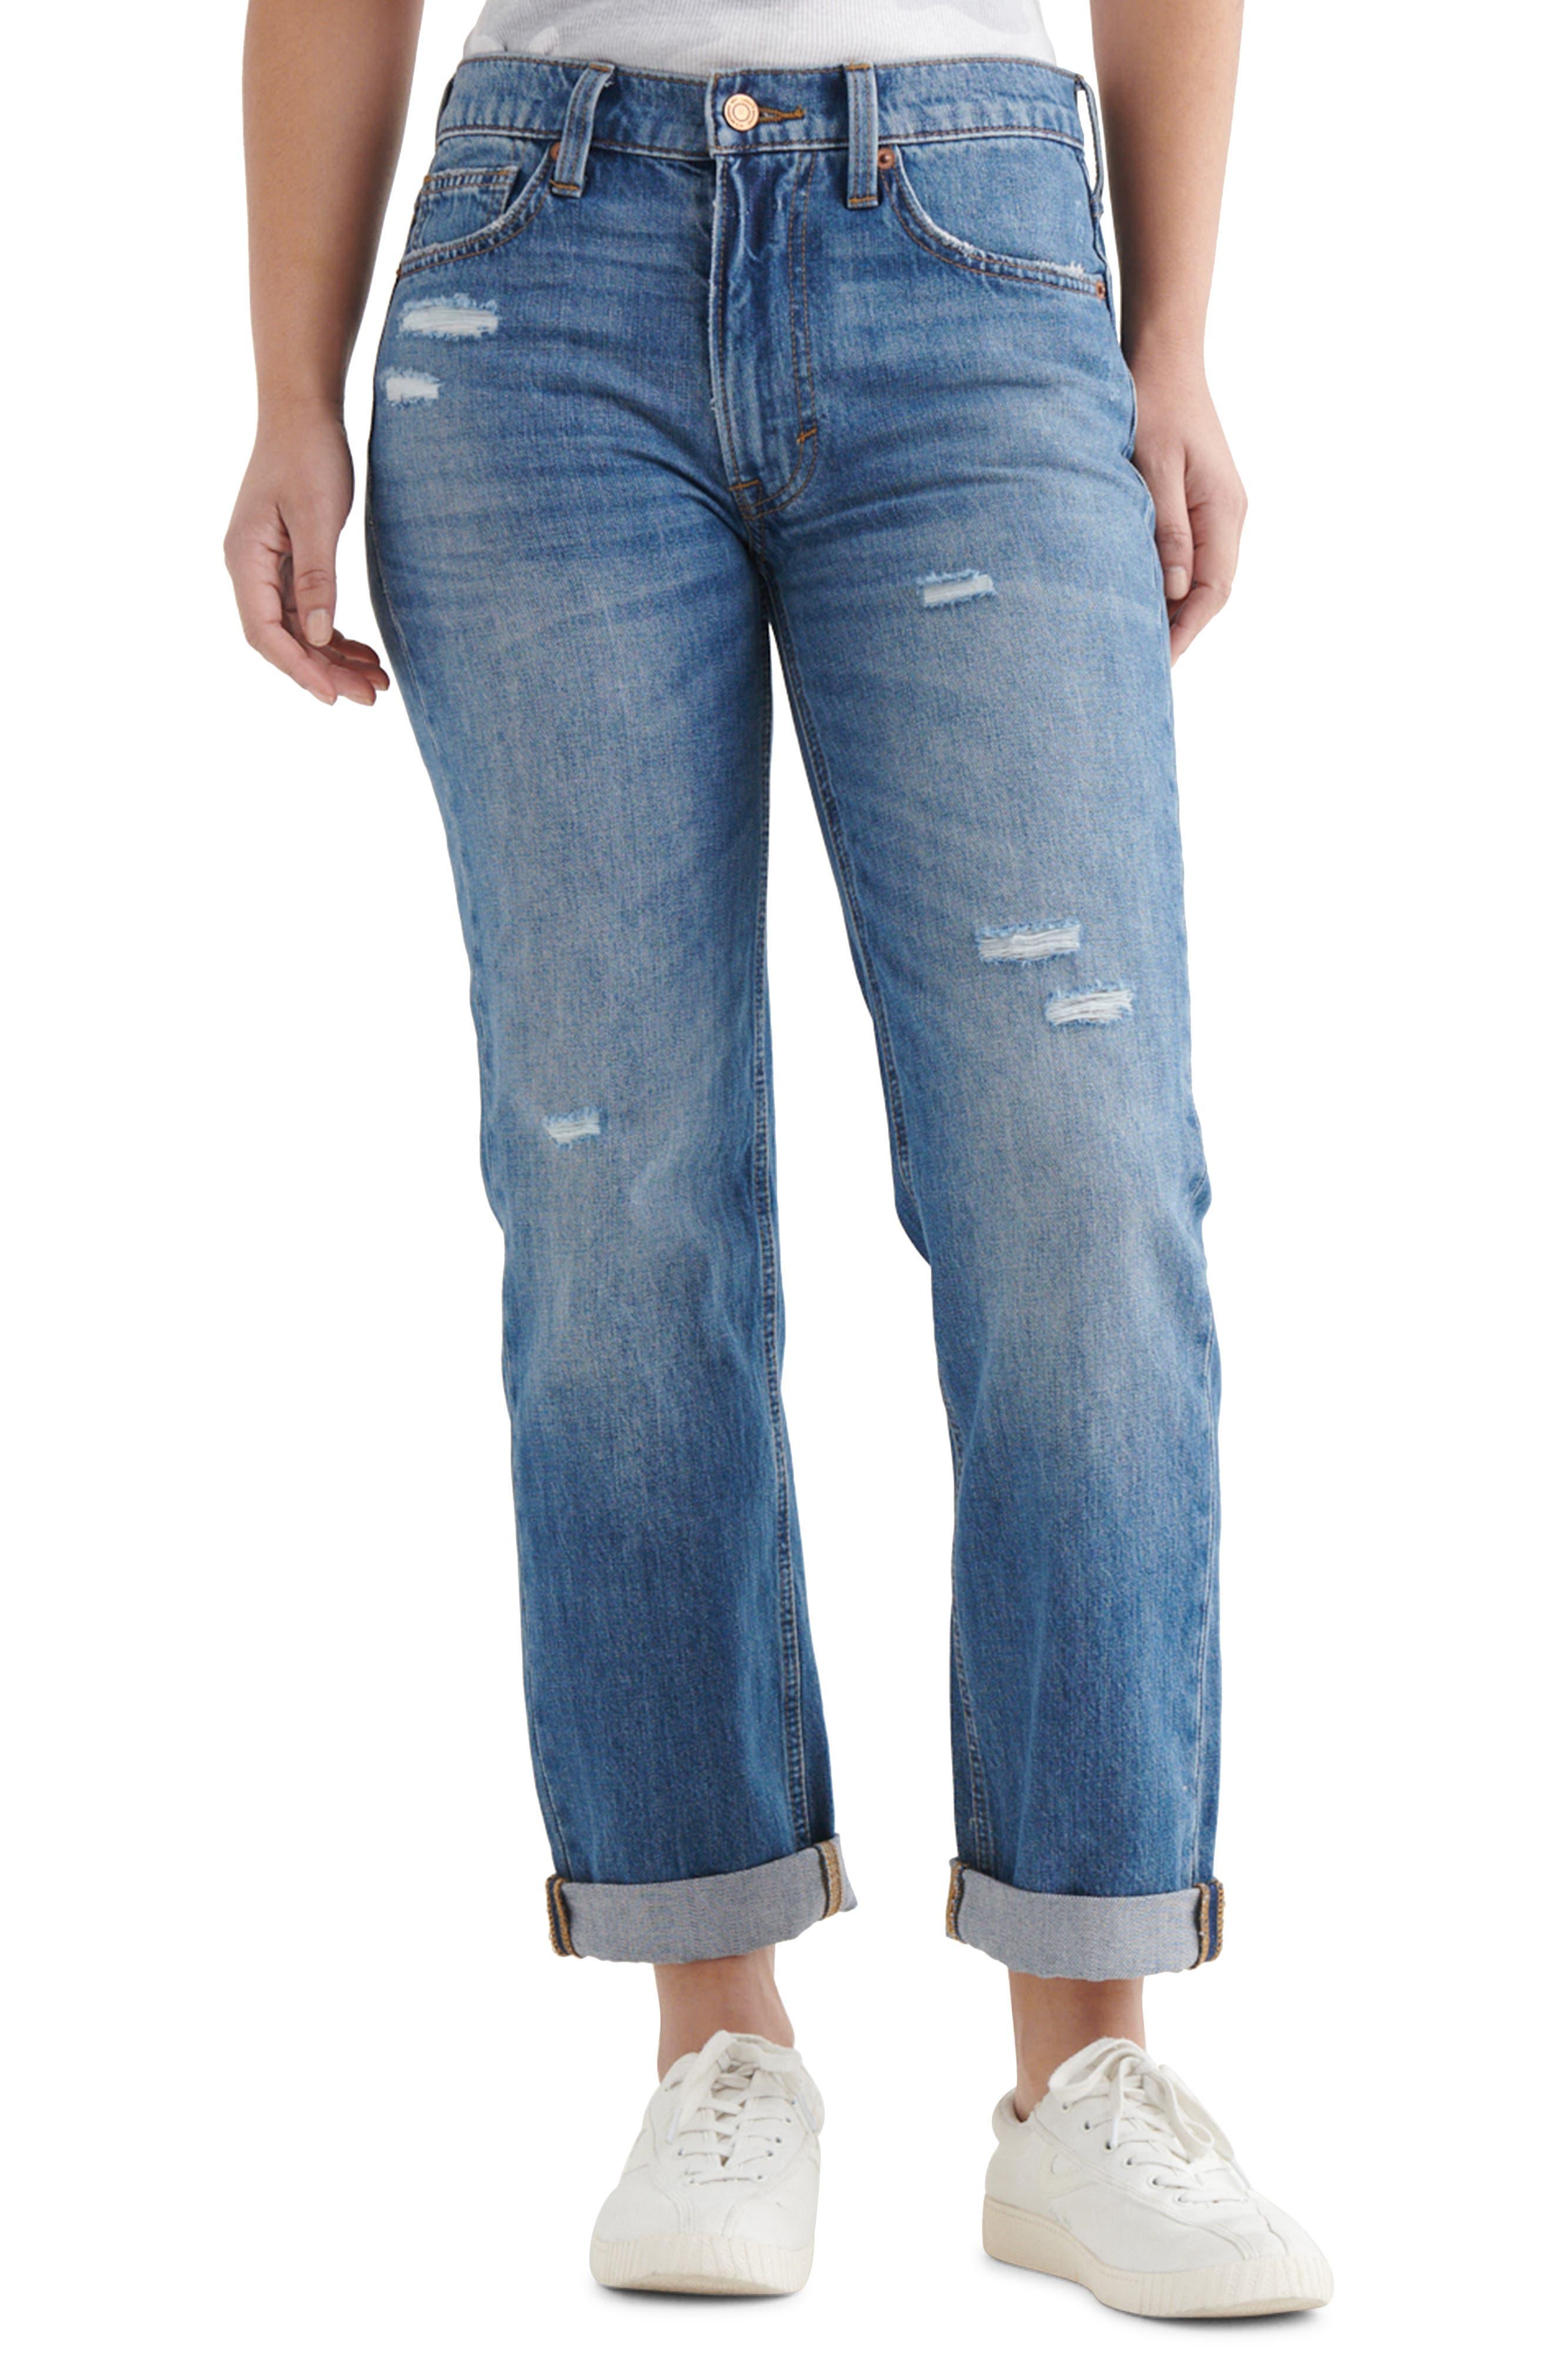 The Boy Jean Distressed Straight Leg Jeans